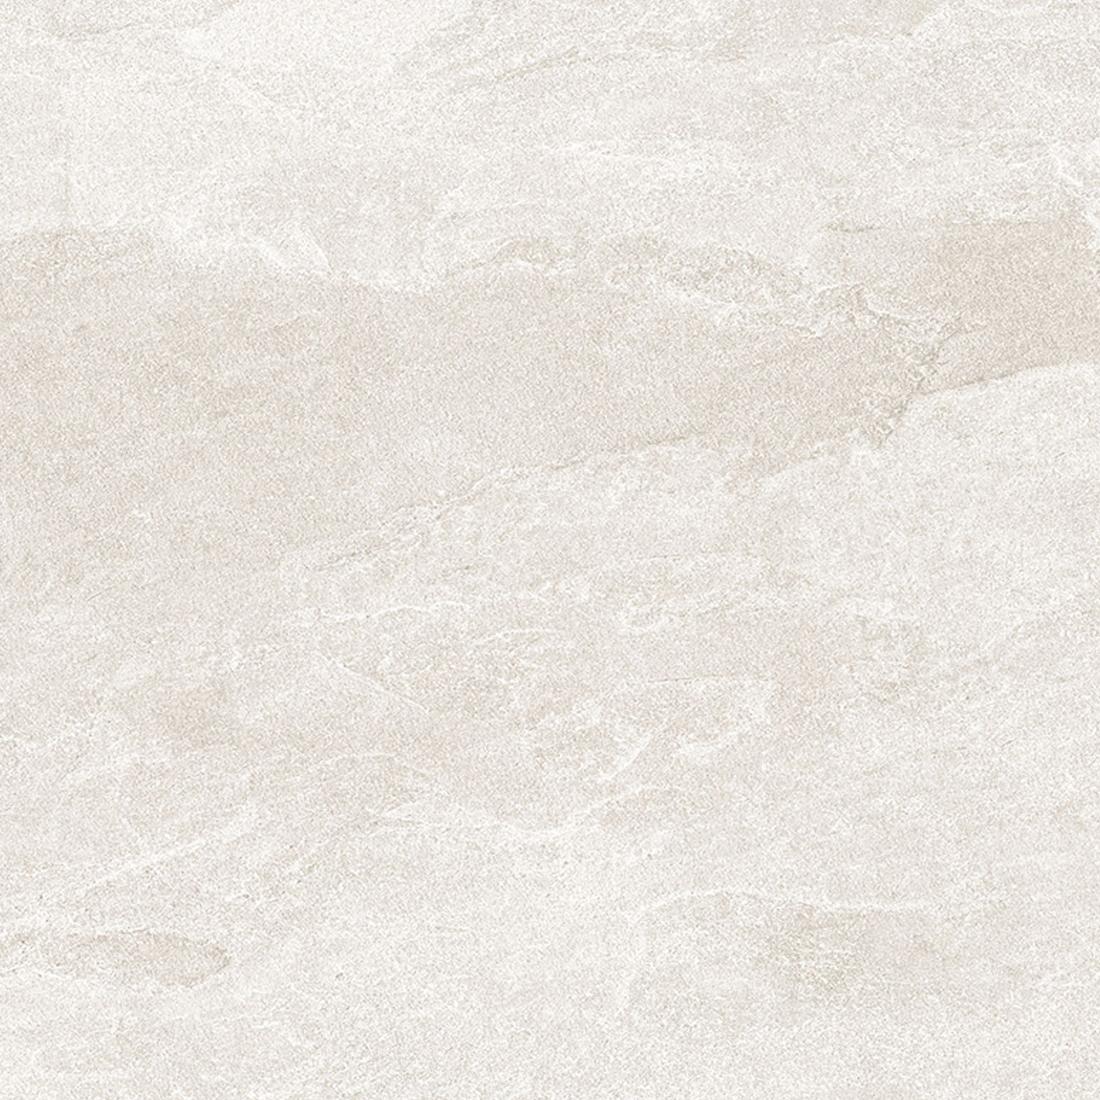 Nitco Nordic White N5301 Matte Glazed Vitrified Tile